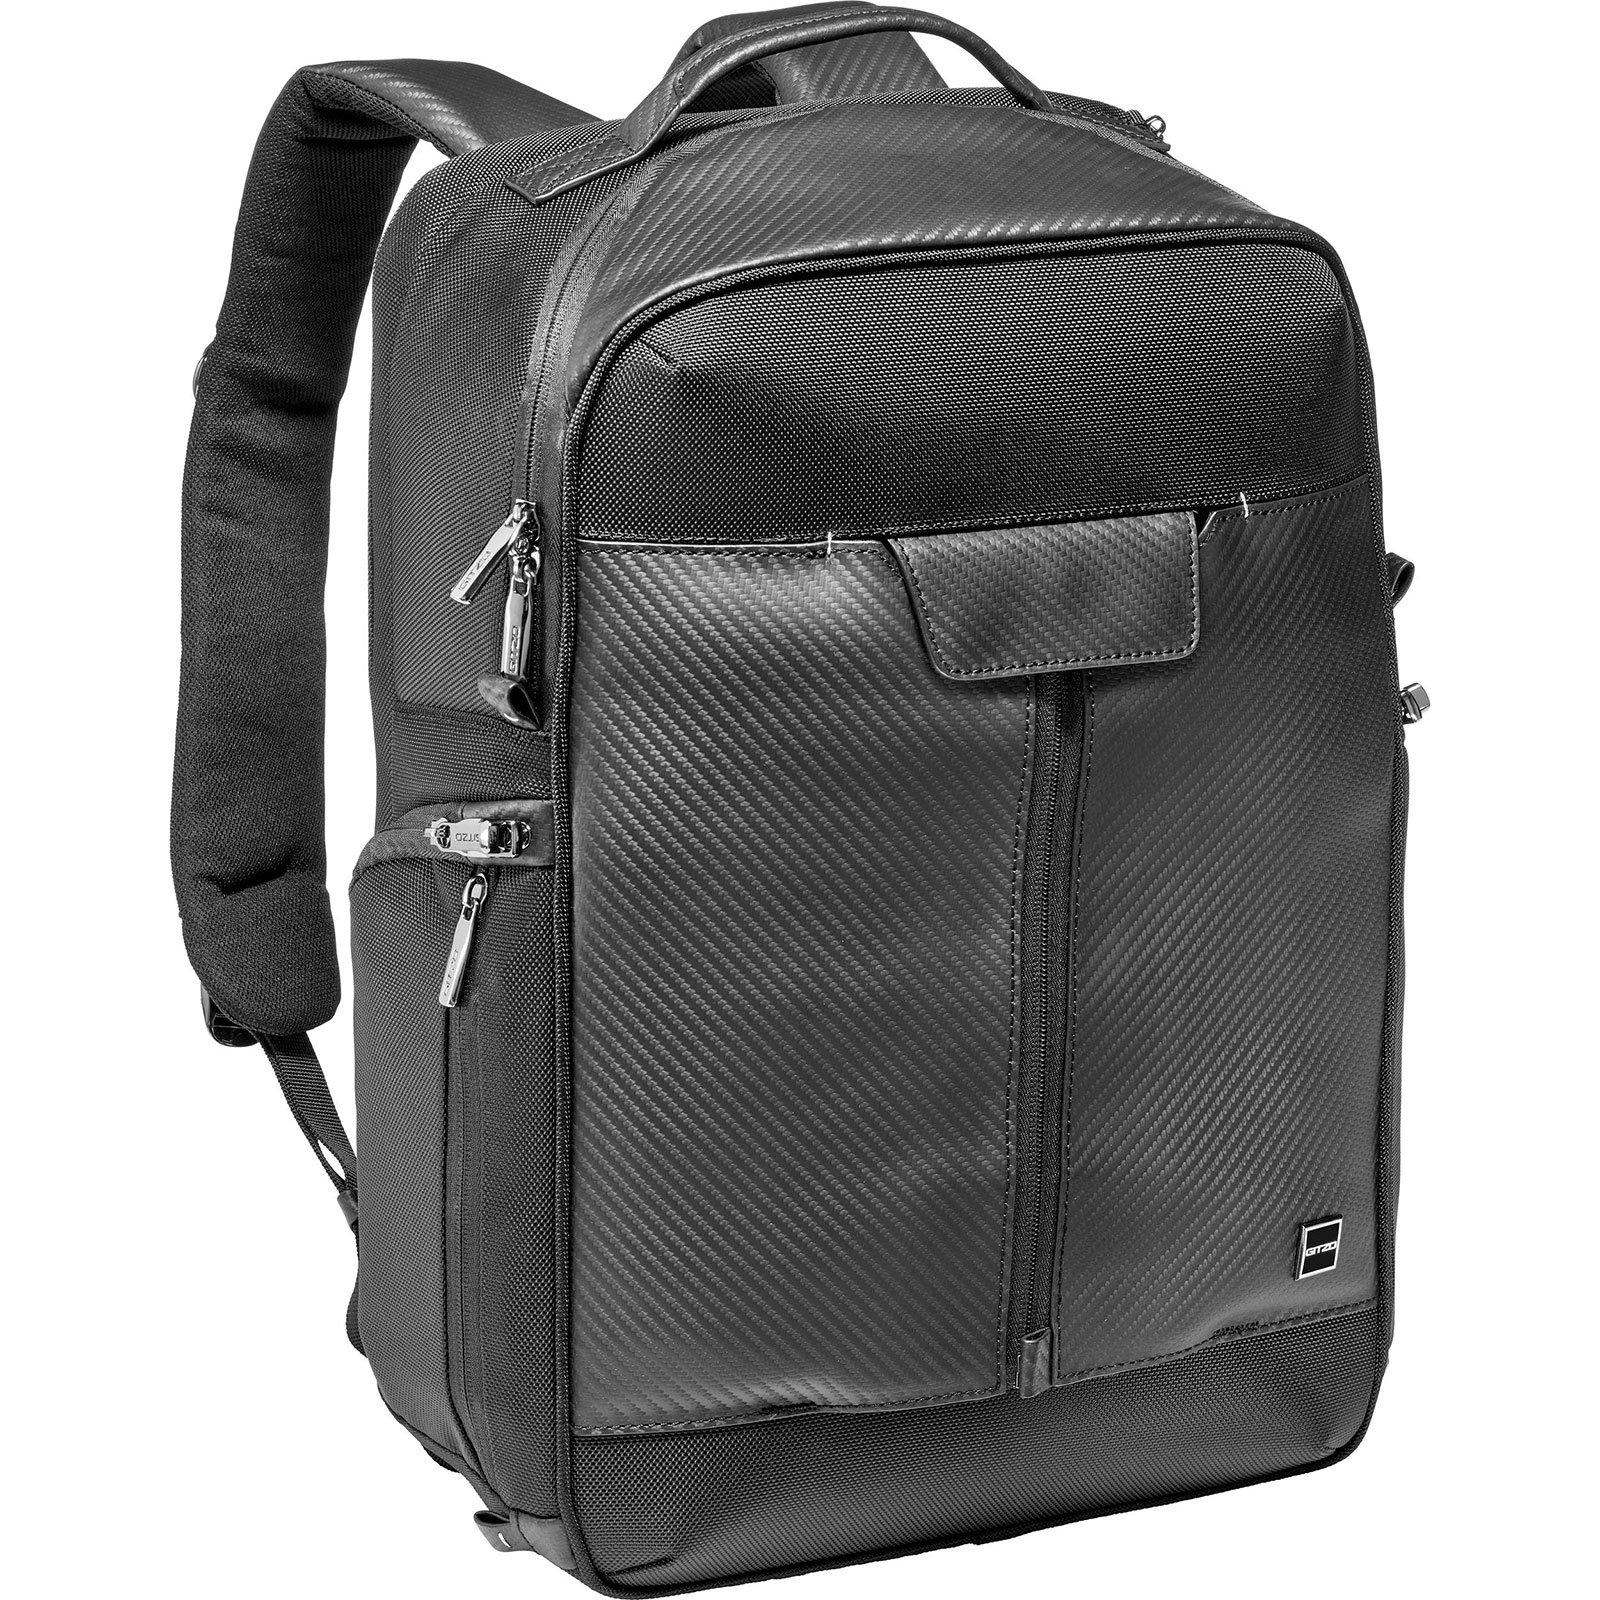 Gitzo Century Traveler Digital SLR Camera Backpack with Flash Diffuser Set + Lens & Sensor Cleaning Pens + Kit by Gitzo (Image #2)